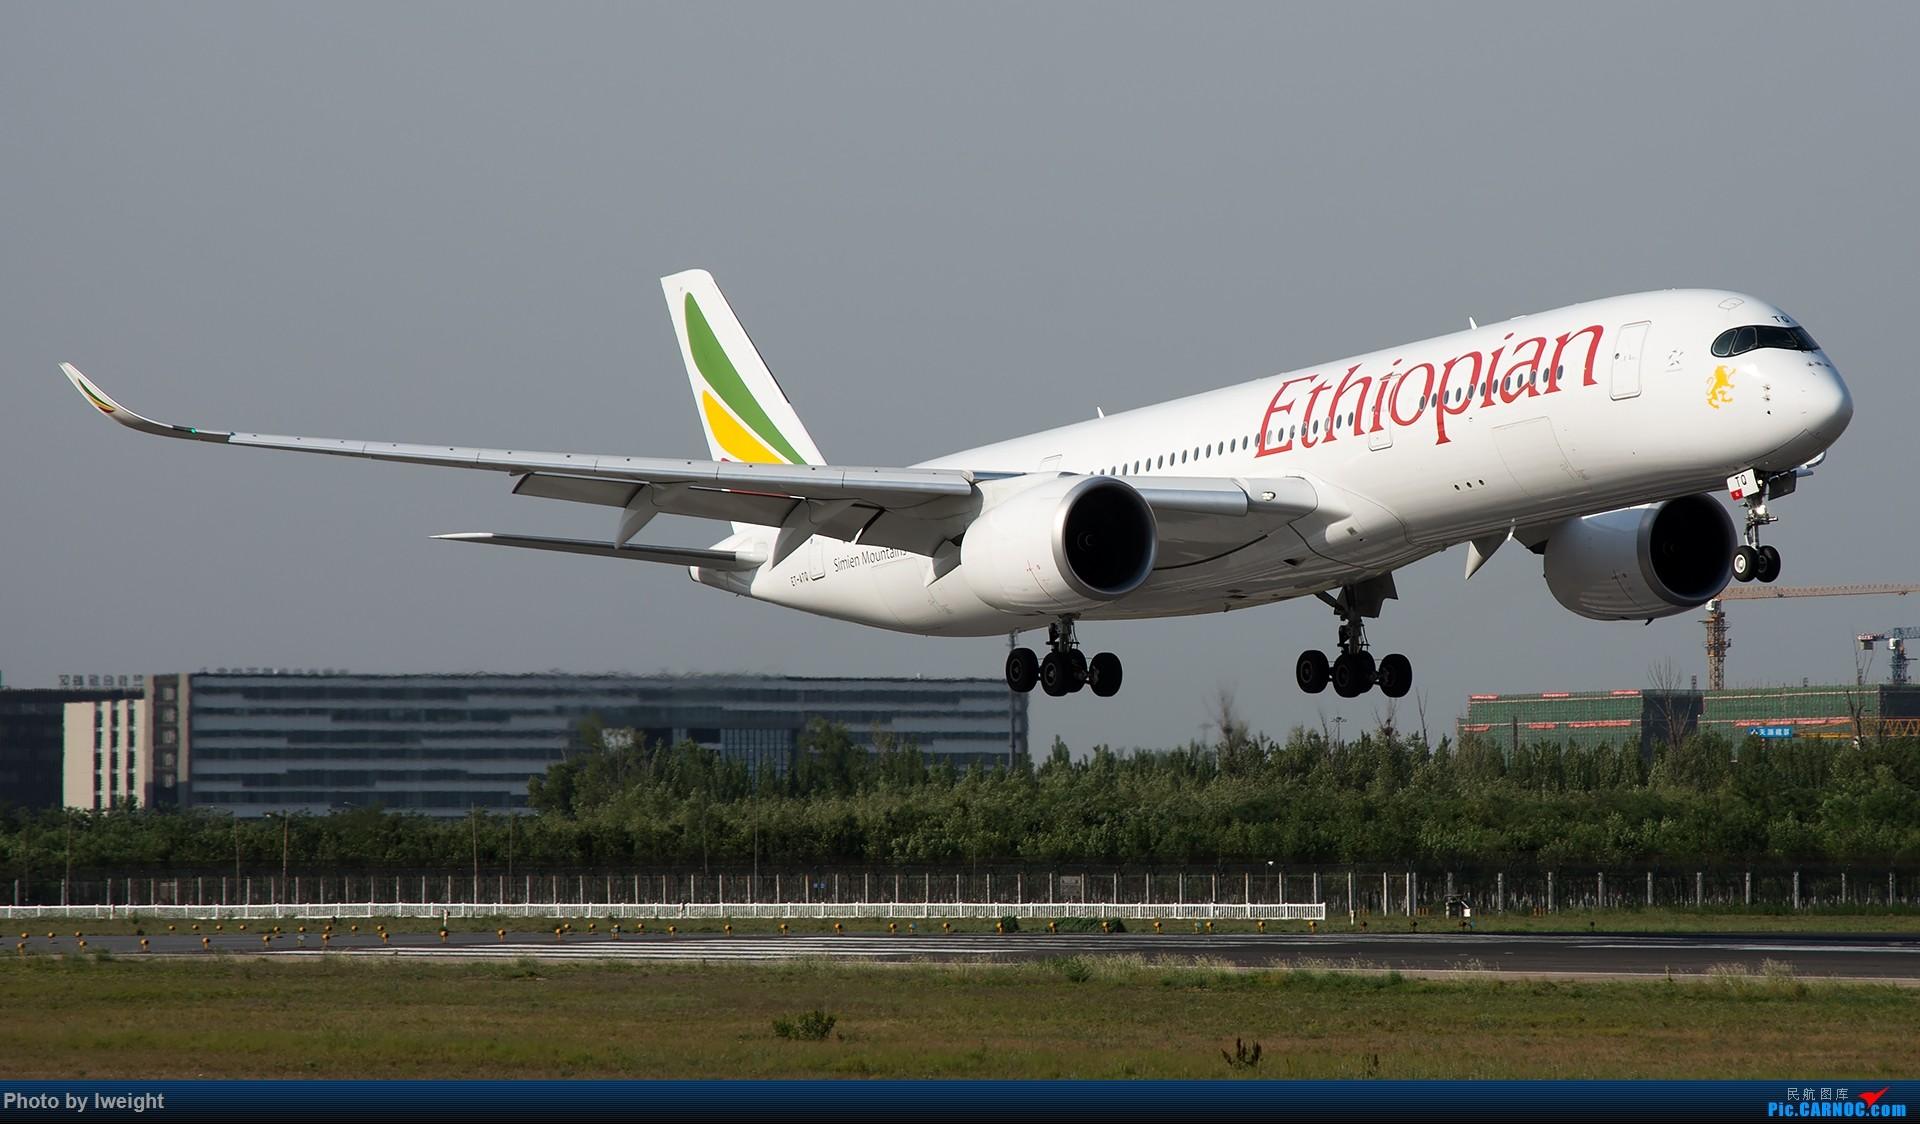 Re:[原创]很不错的天气,18R一组 AIRBUS A350-900 ET-ATQ 中国北京首都国际机场